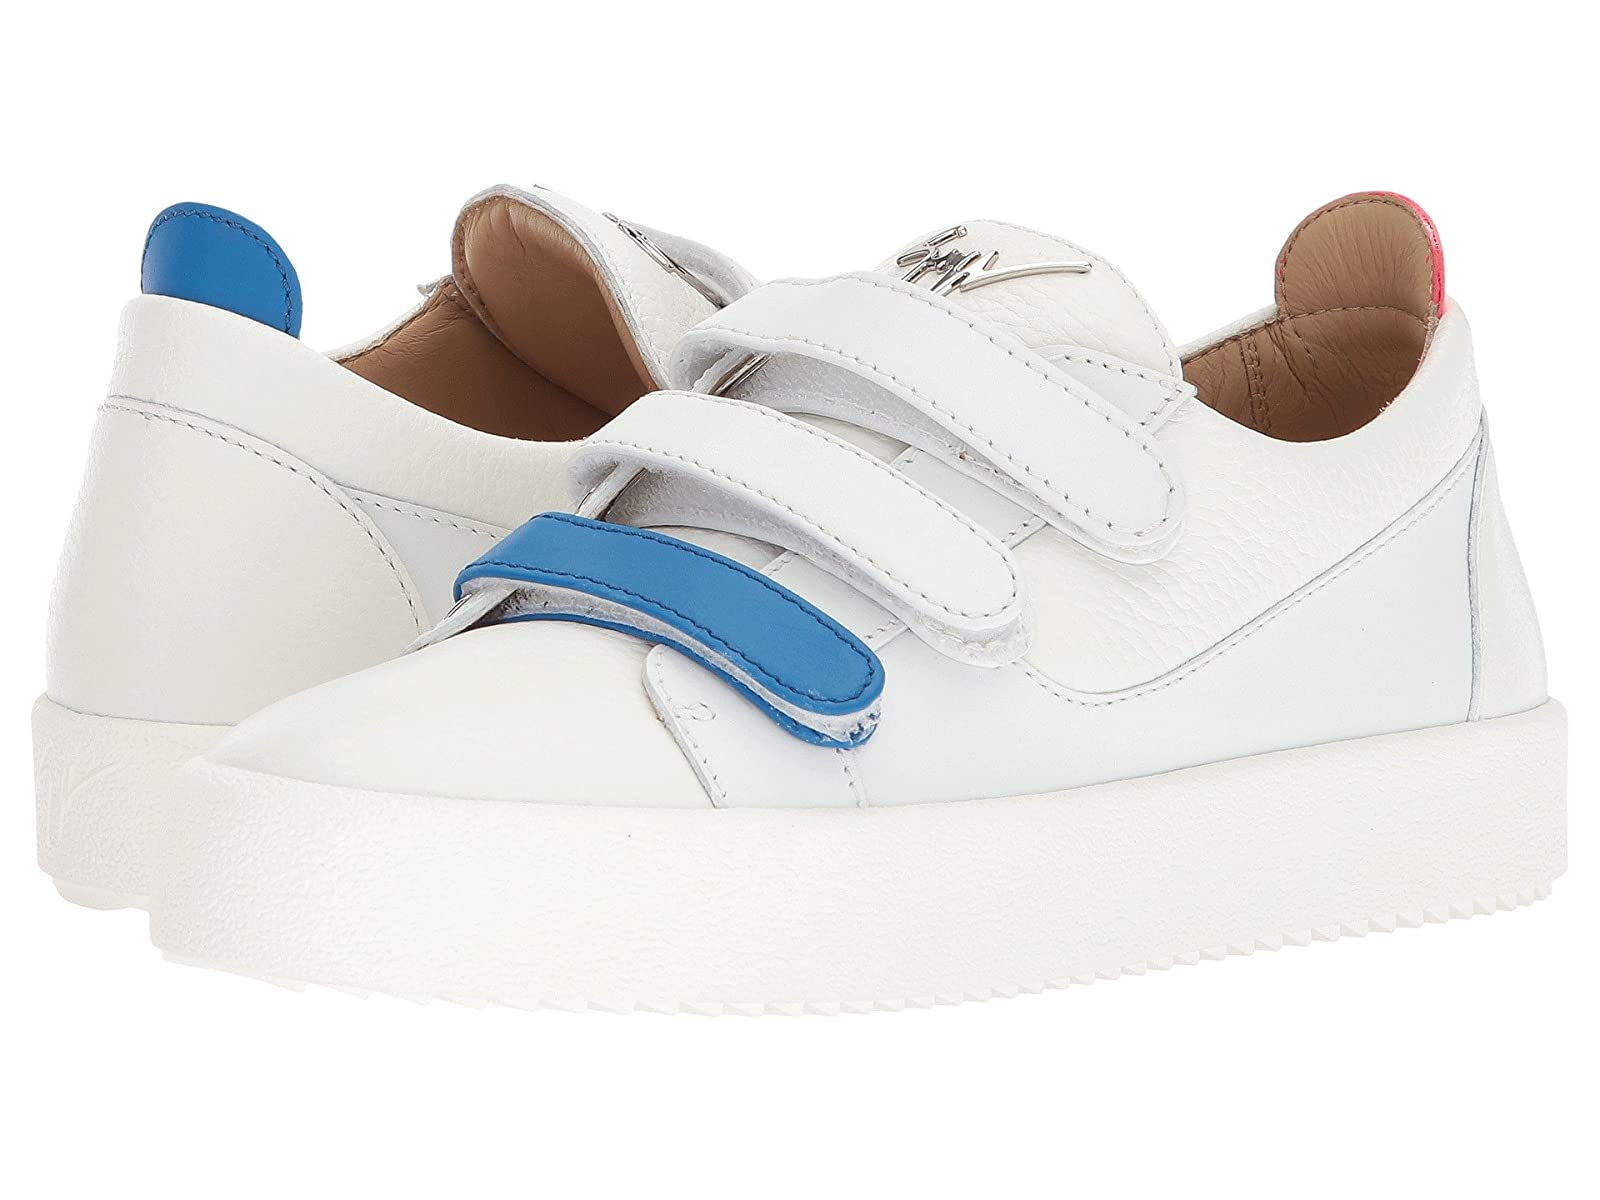 Giuseppe Zanotti RS80014Cheap and distinctive eye-catching shoes